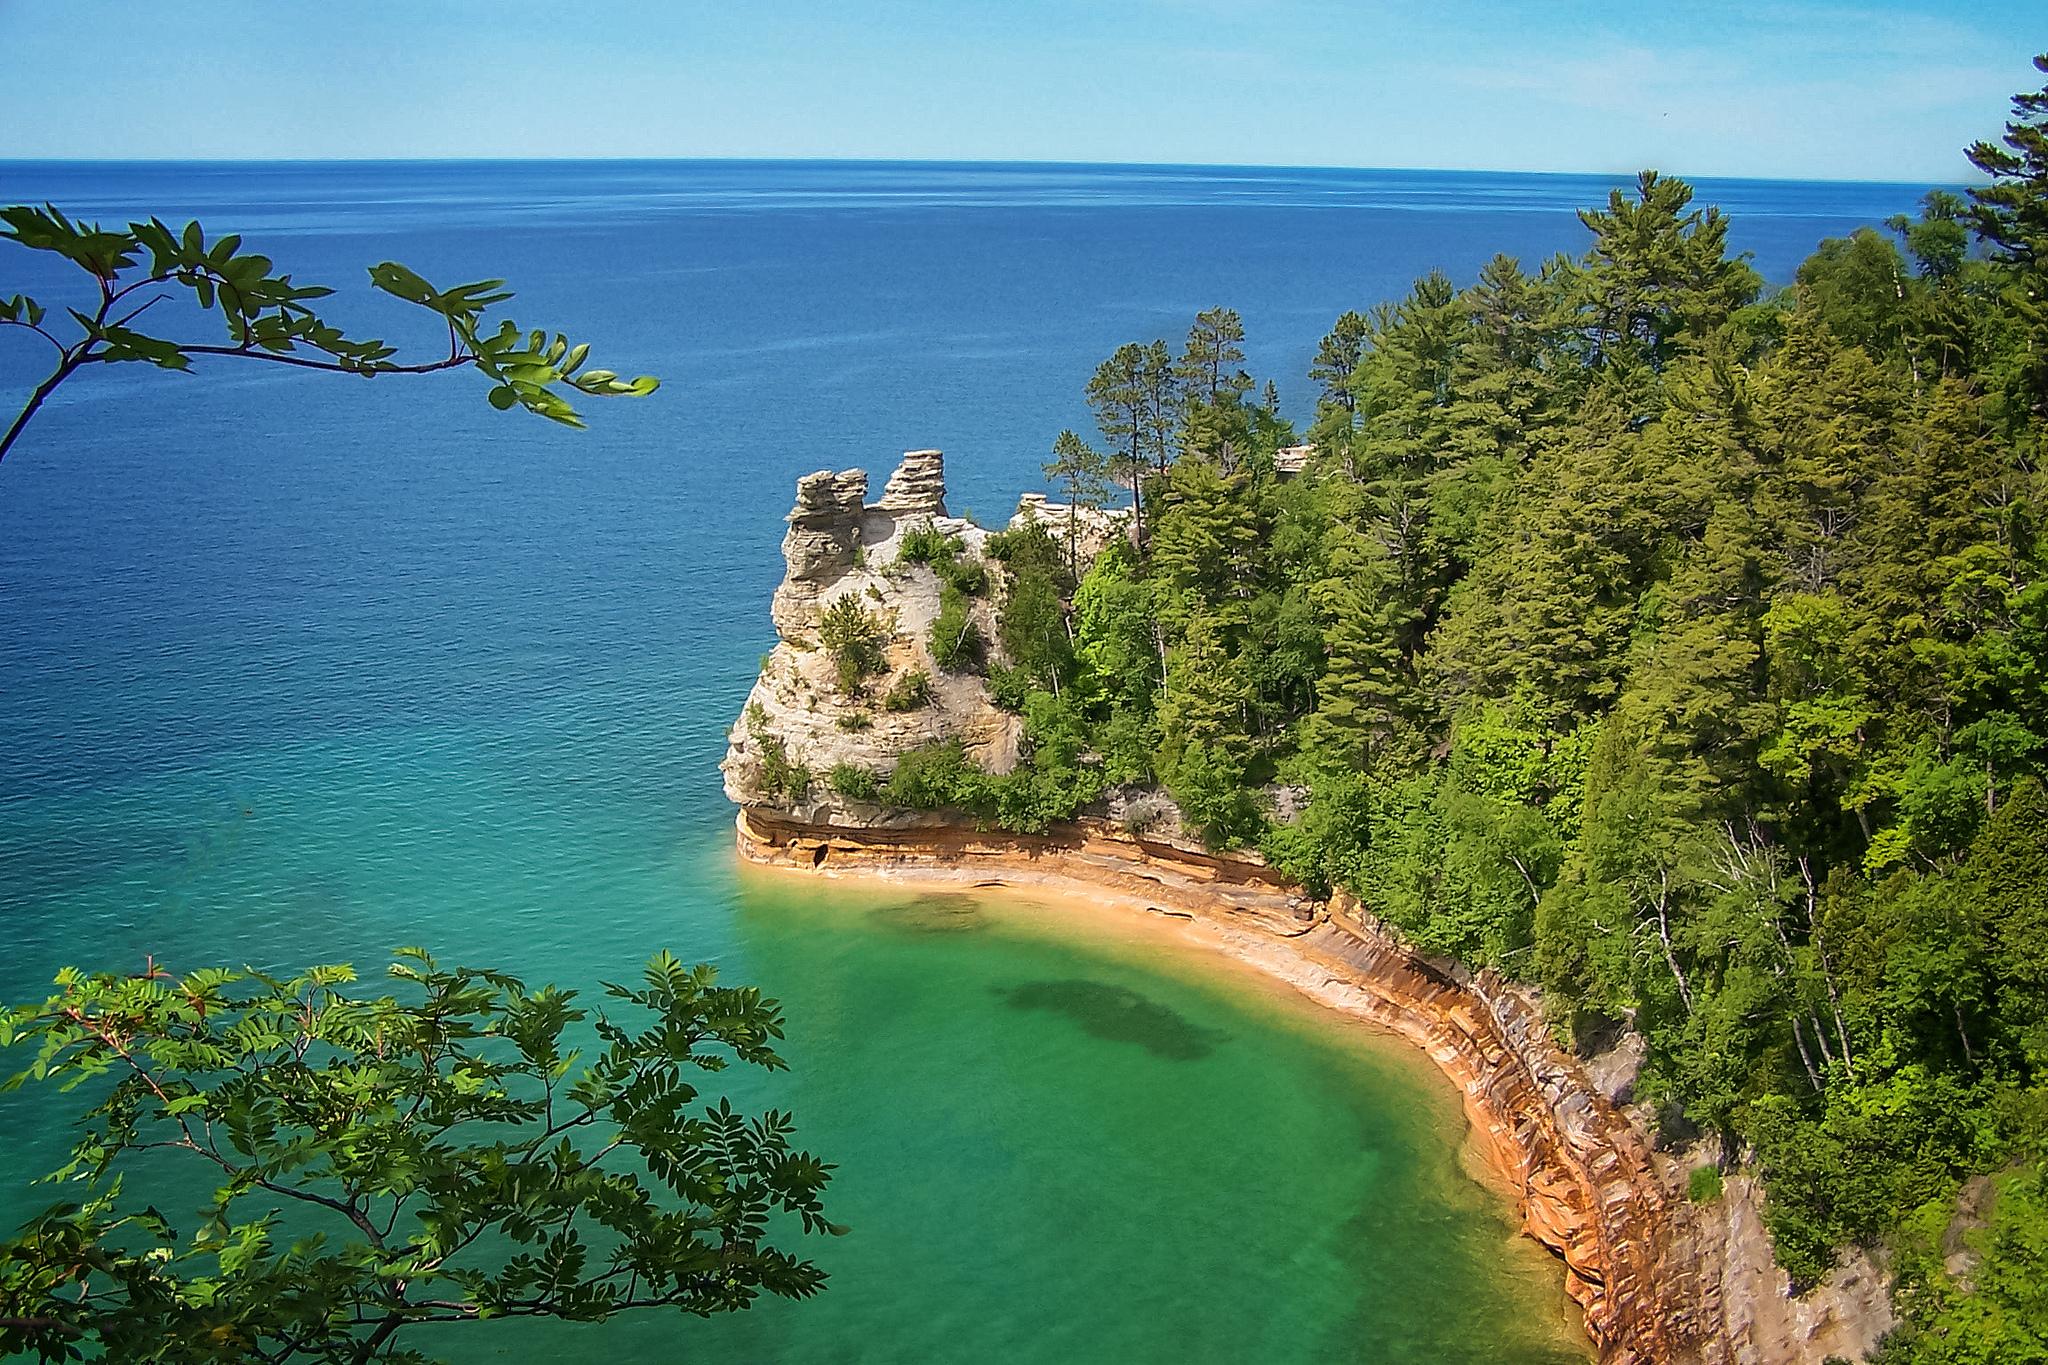 17 Simply Incredible Photos Of Michigan's Great Lakes